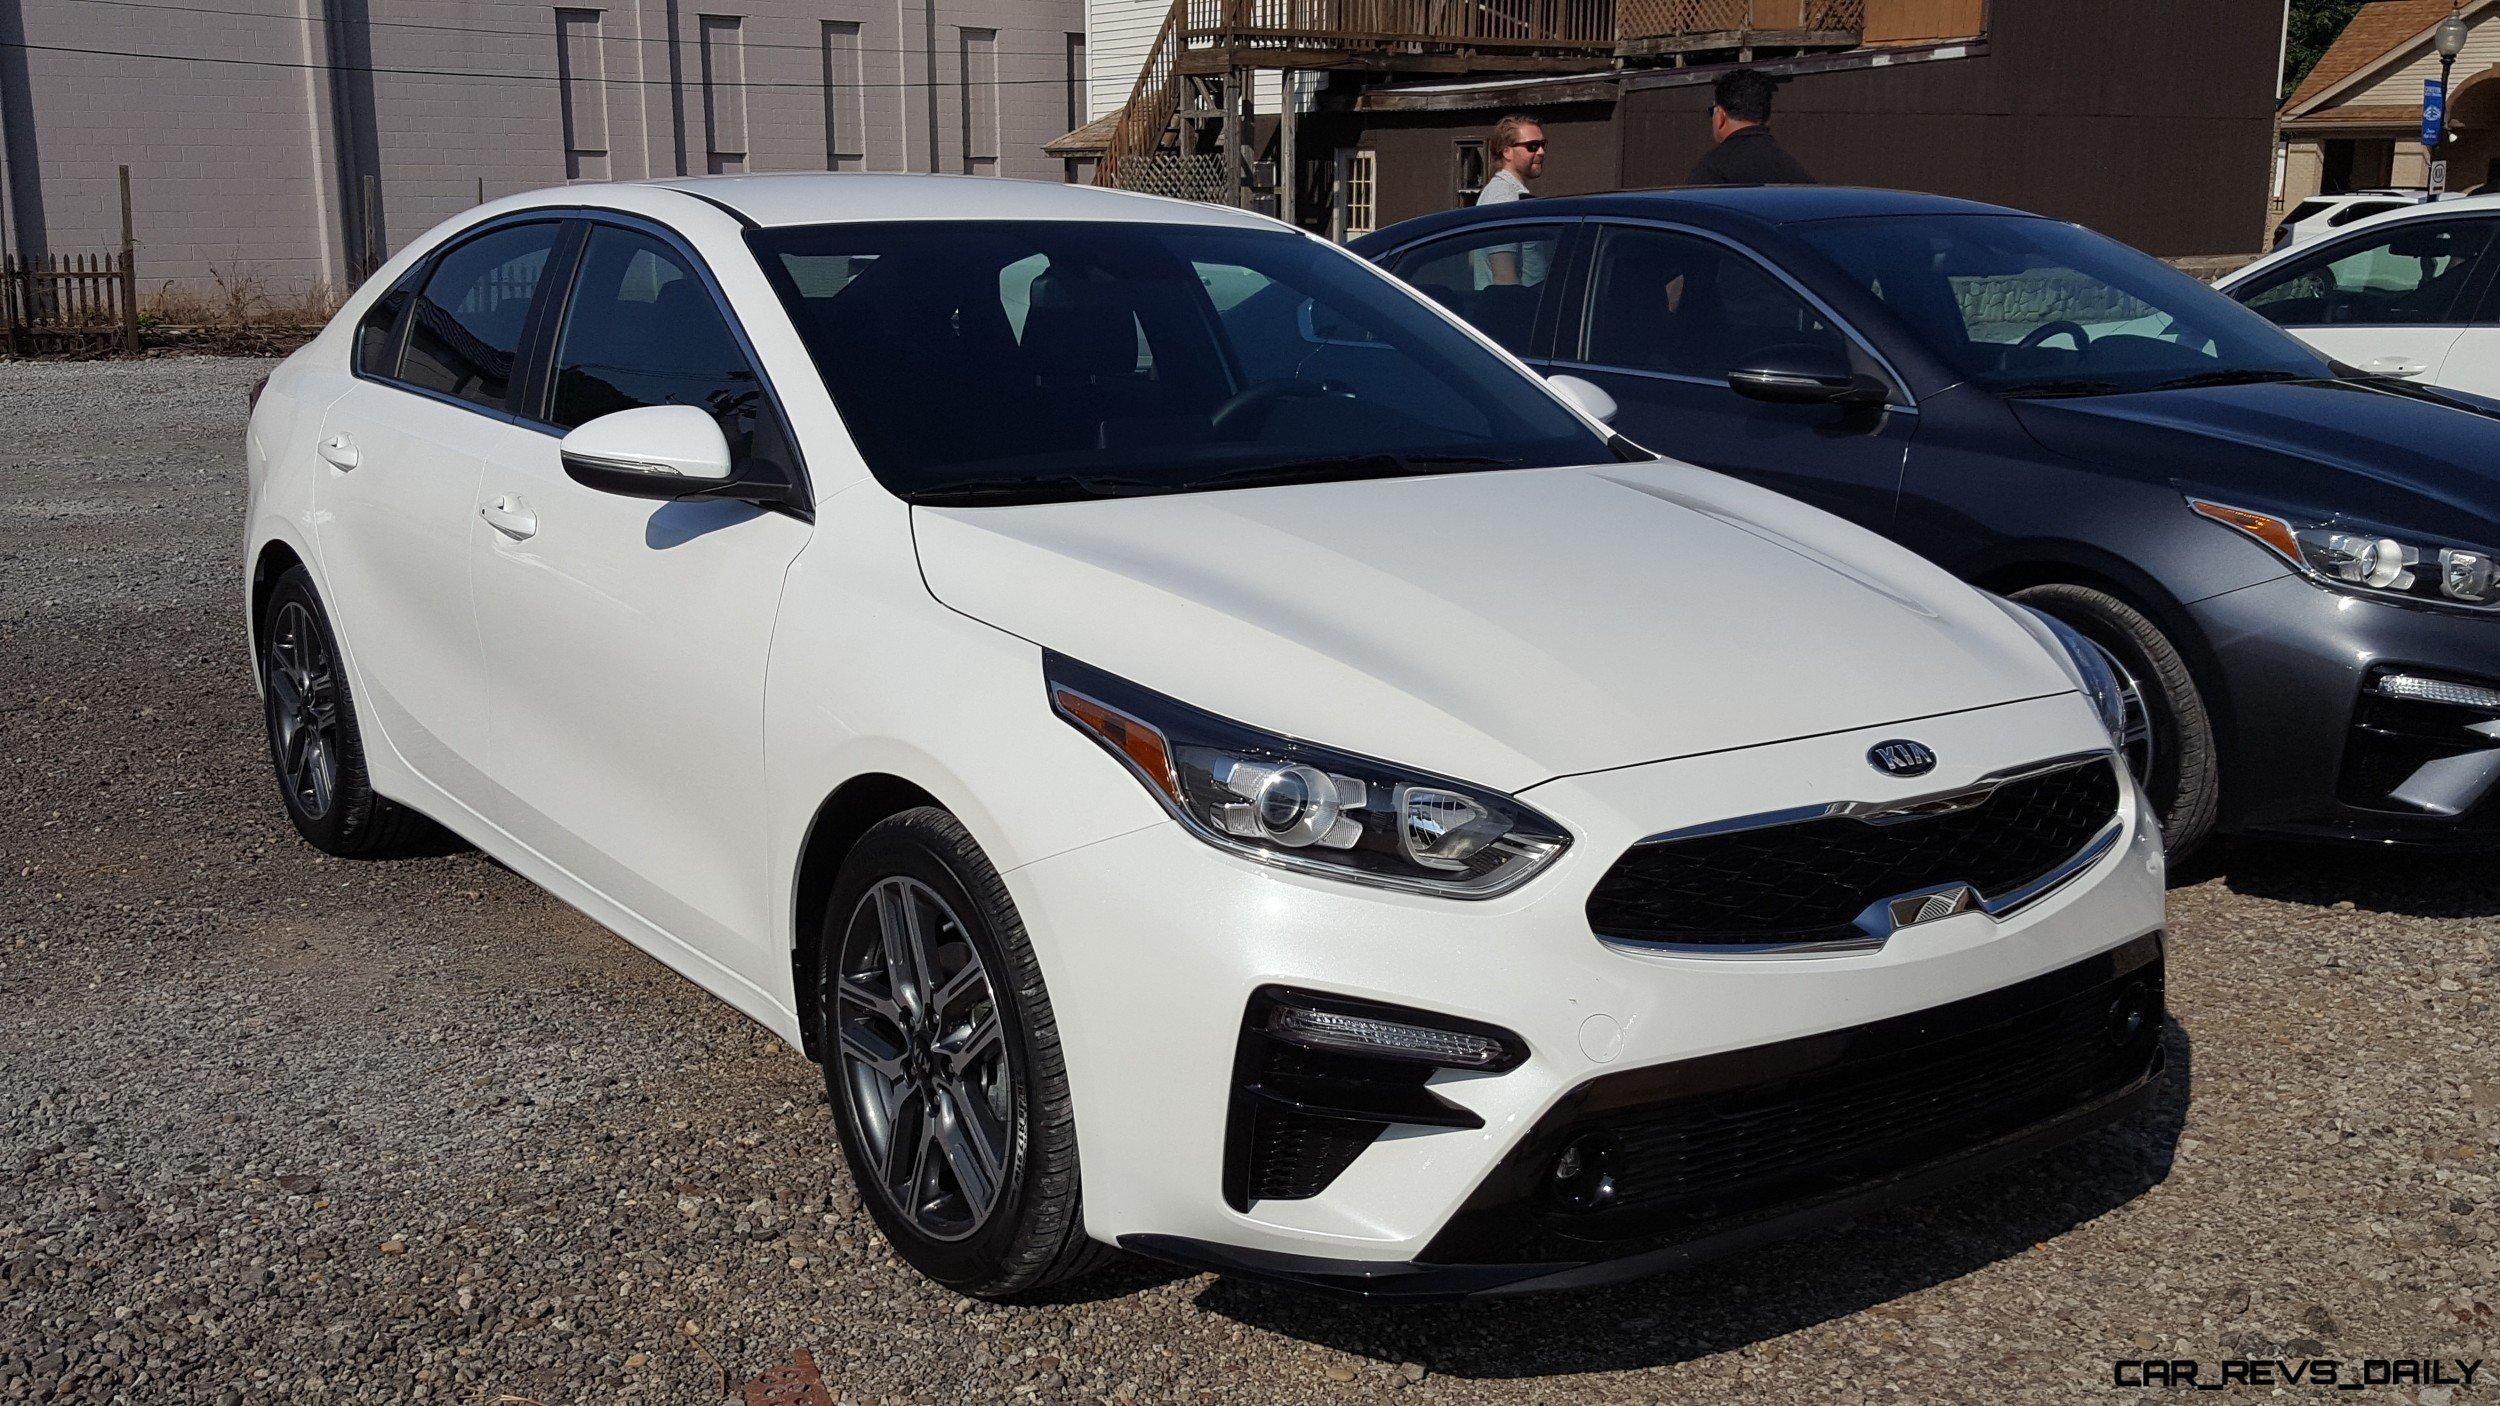 Road Test Review – 2019 Kia Forte EX – By Carl Malek